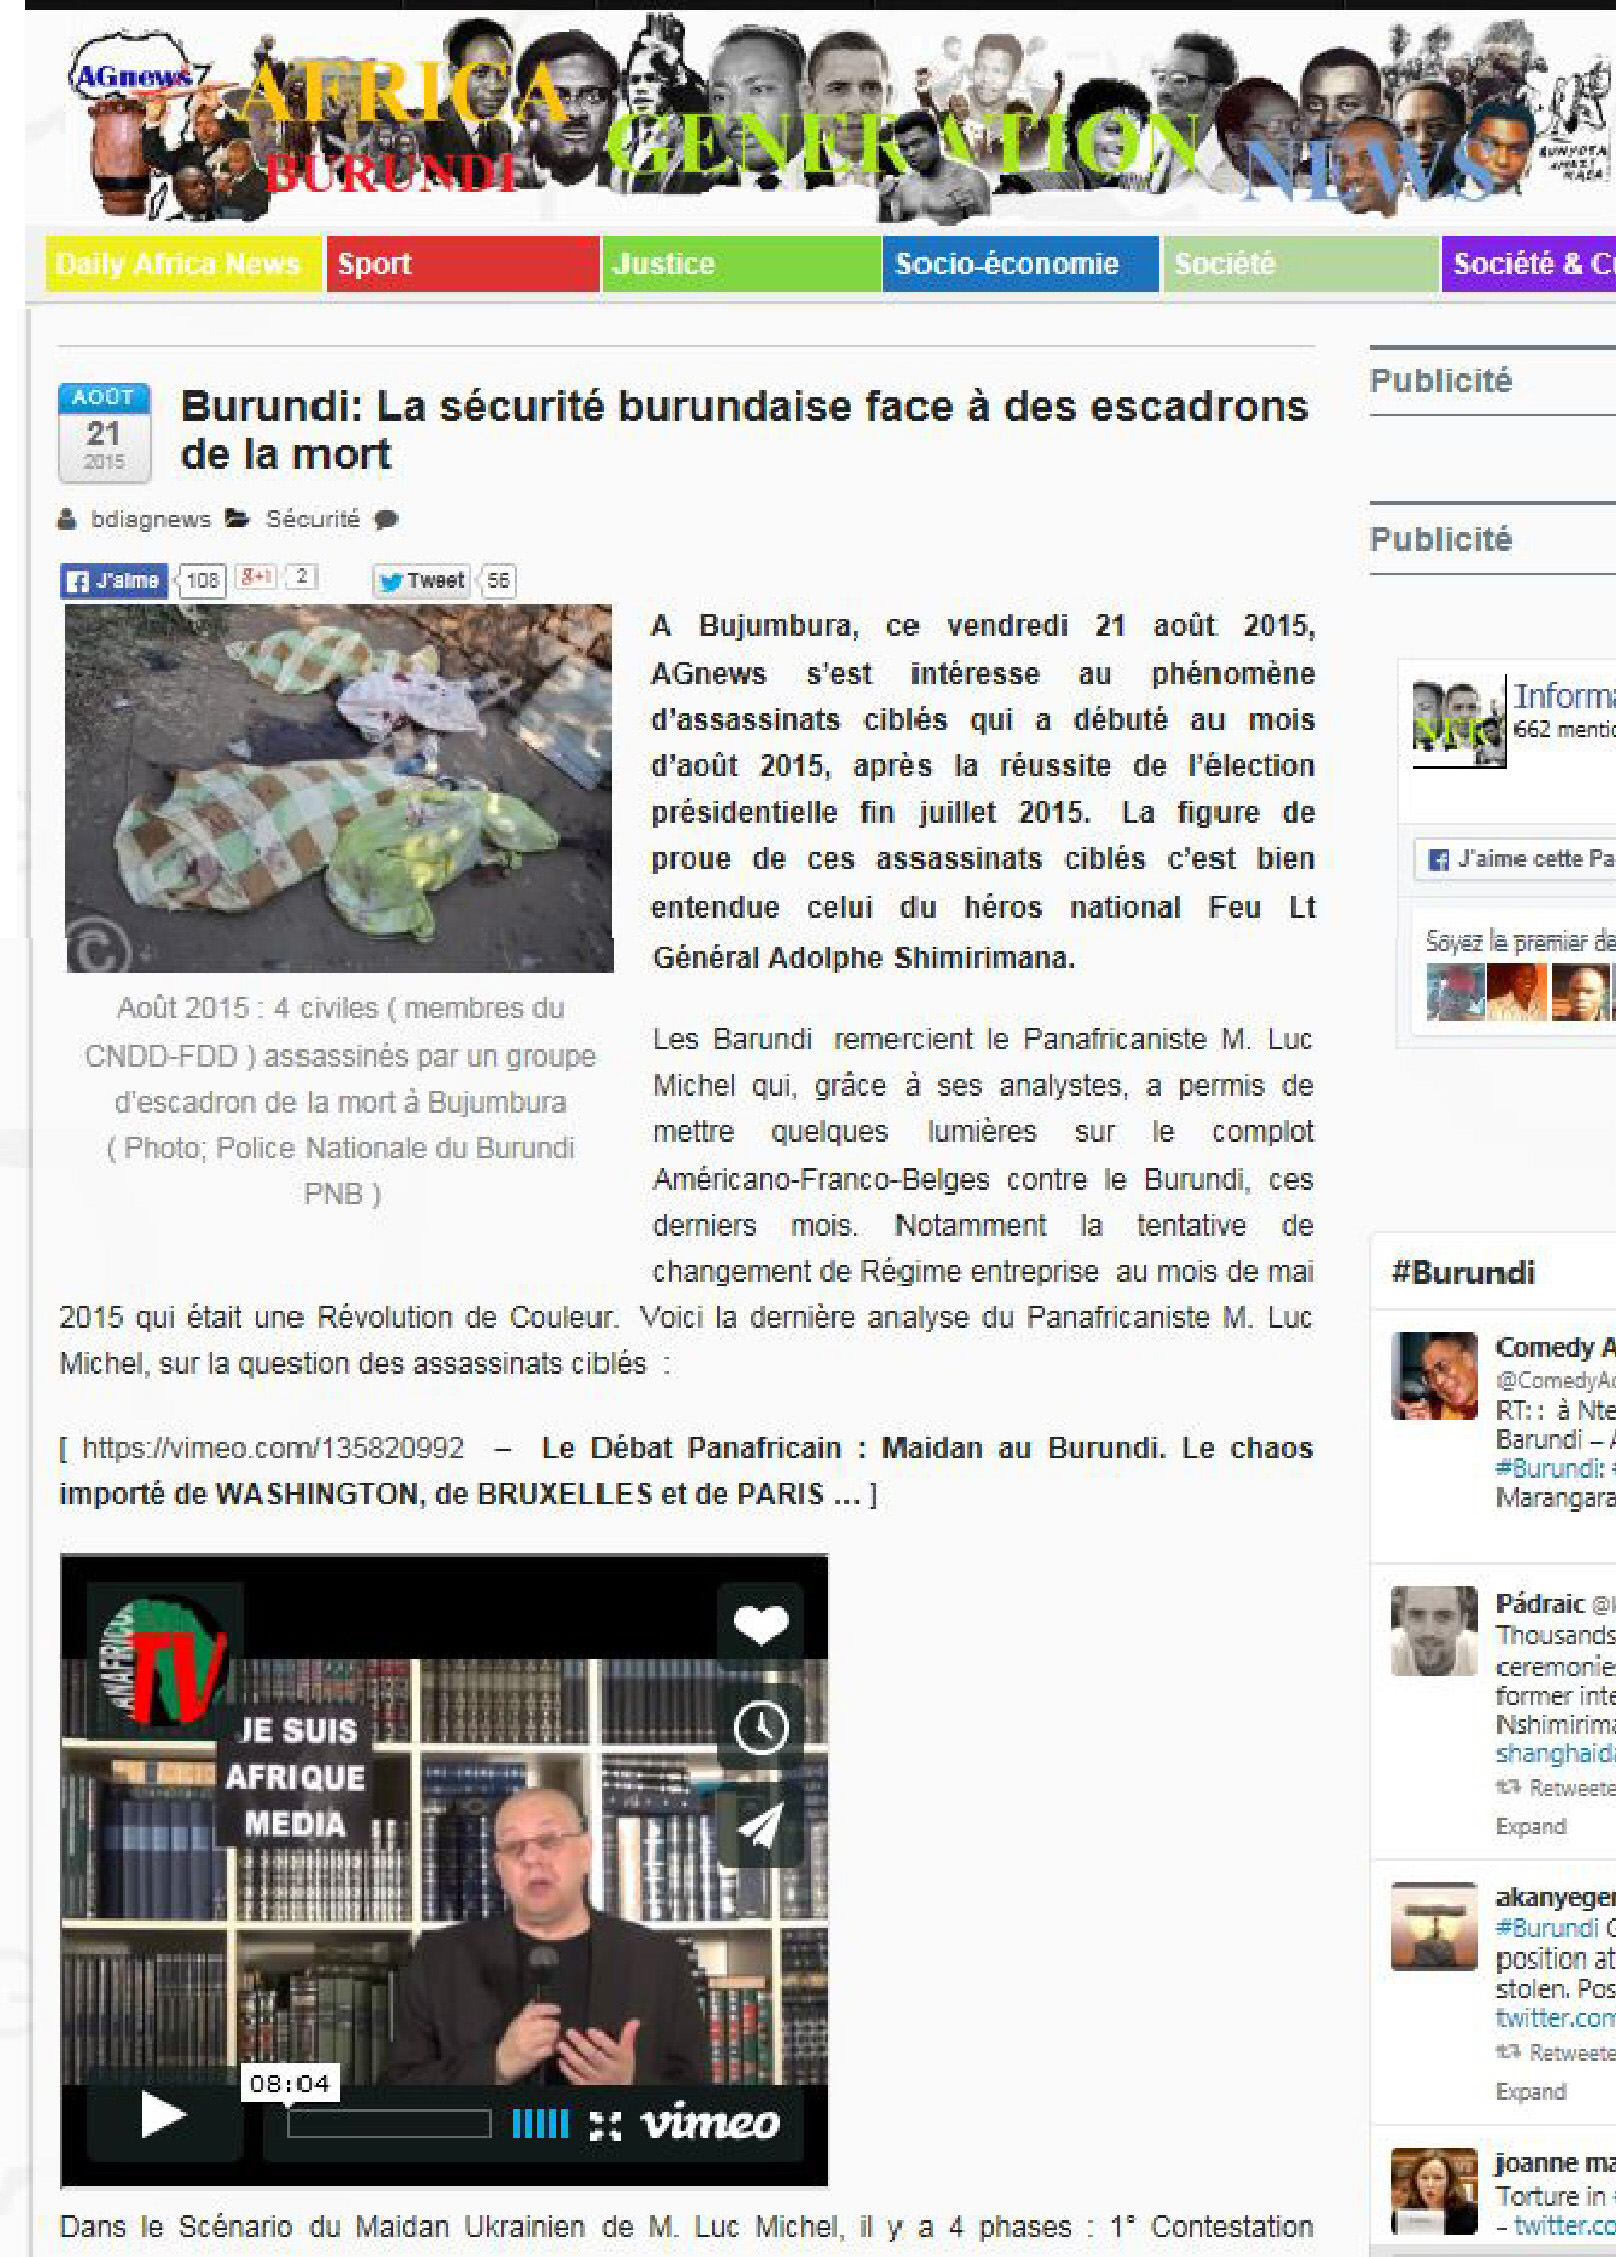 LM.NET - EN BREF lm ds Agnews burundi (2015 08 21) FR